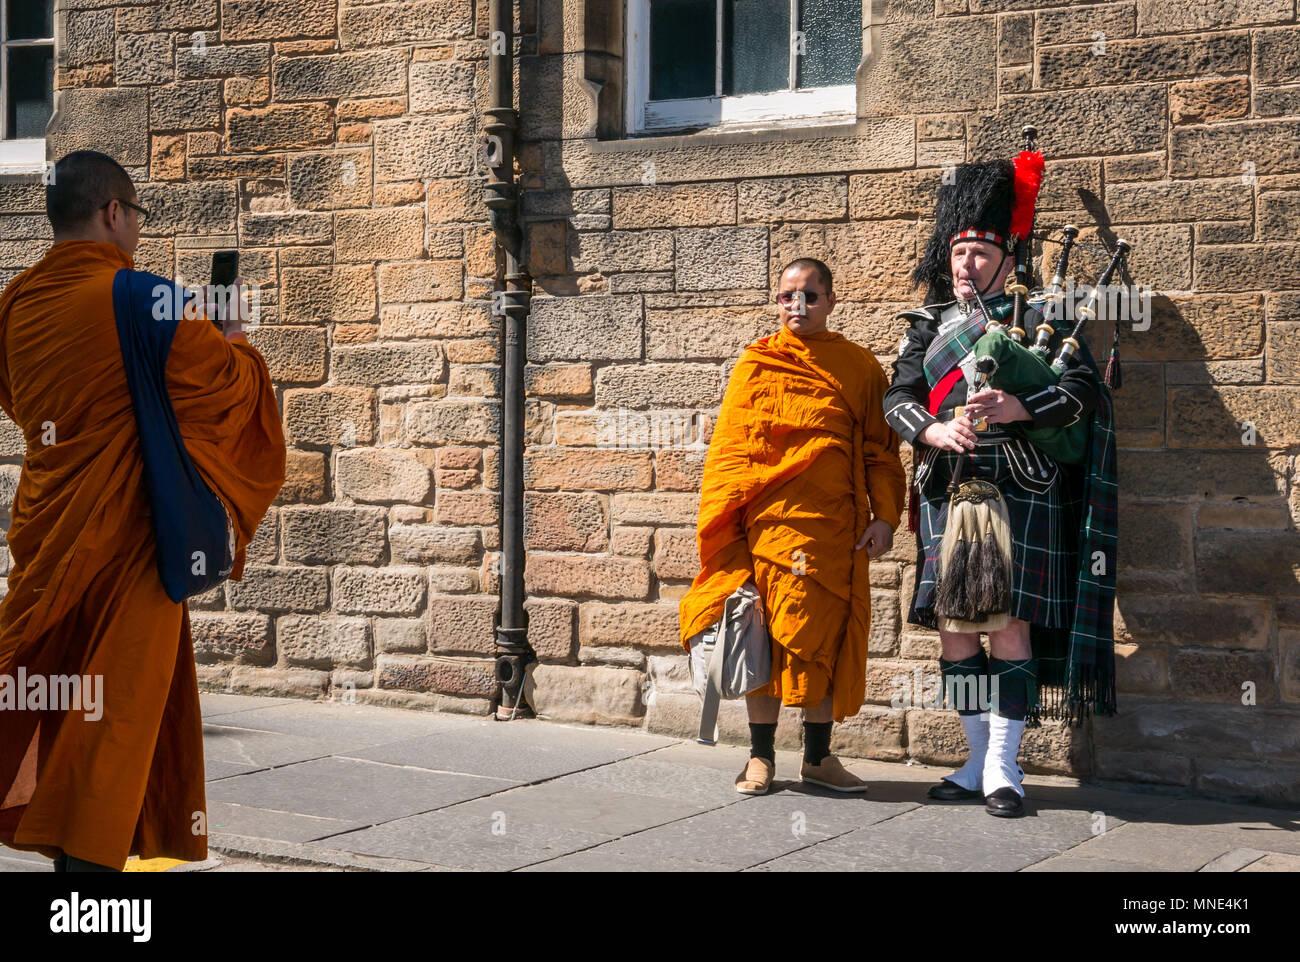 royal-mile-edinburgh-16th-may-2018-touri